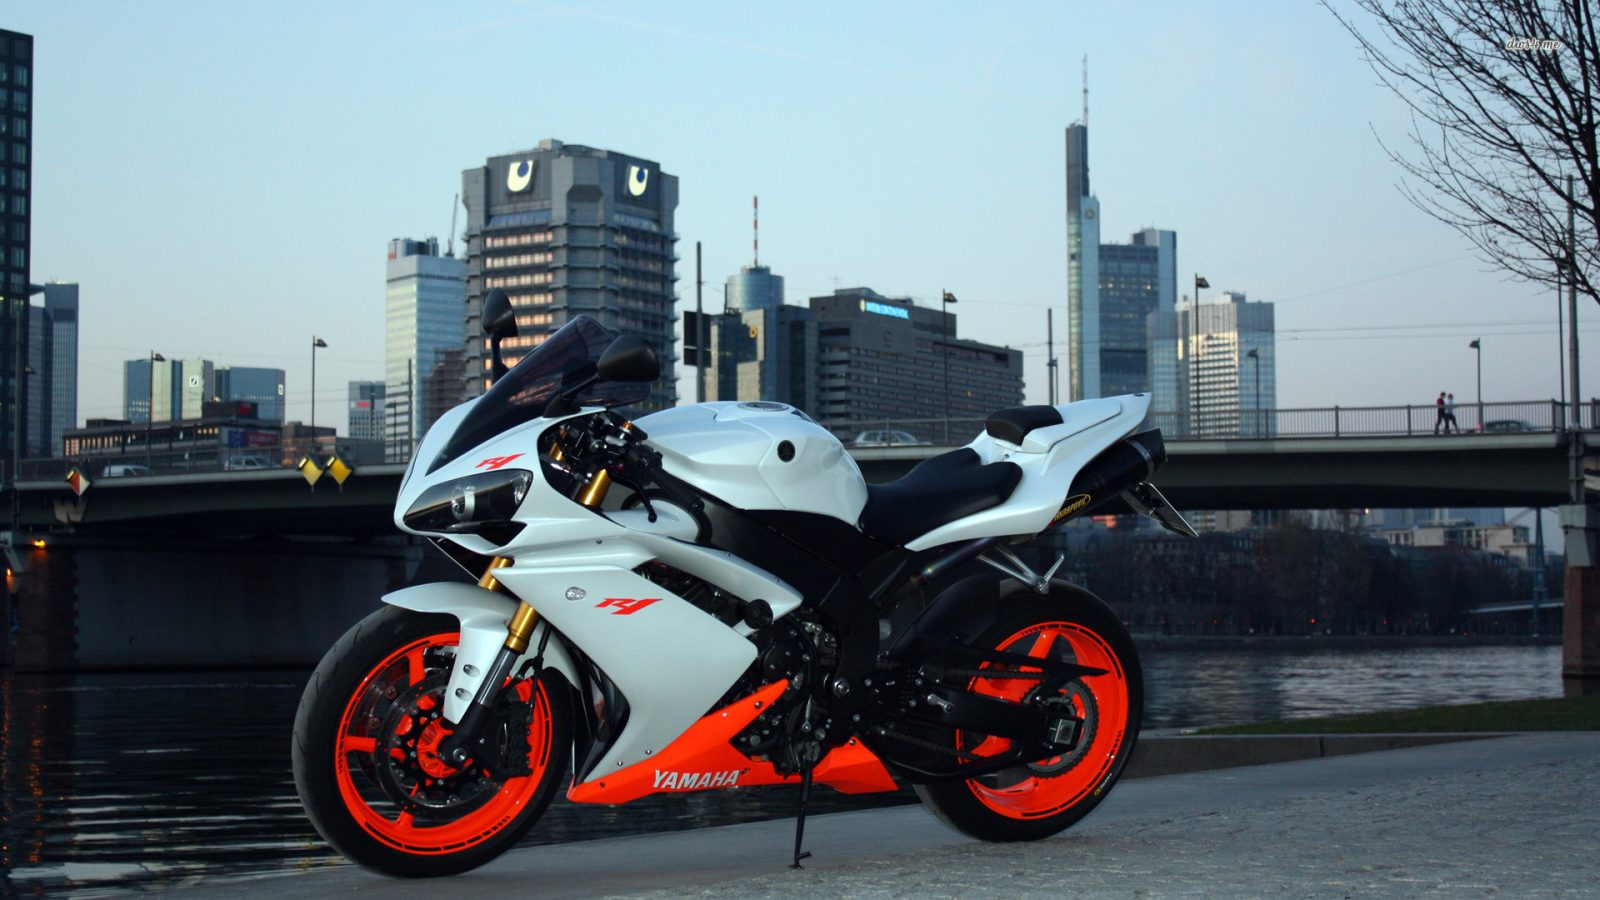 Yamaha YZF-R1 (Orange & White) HD Wallpaper